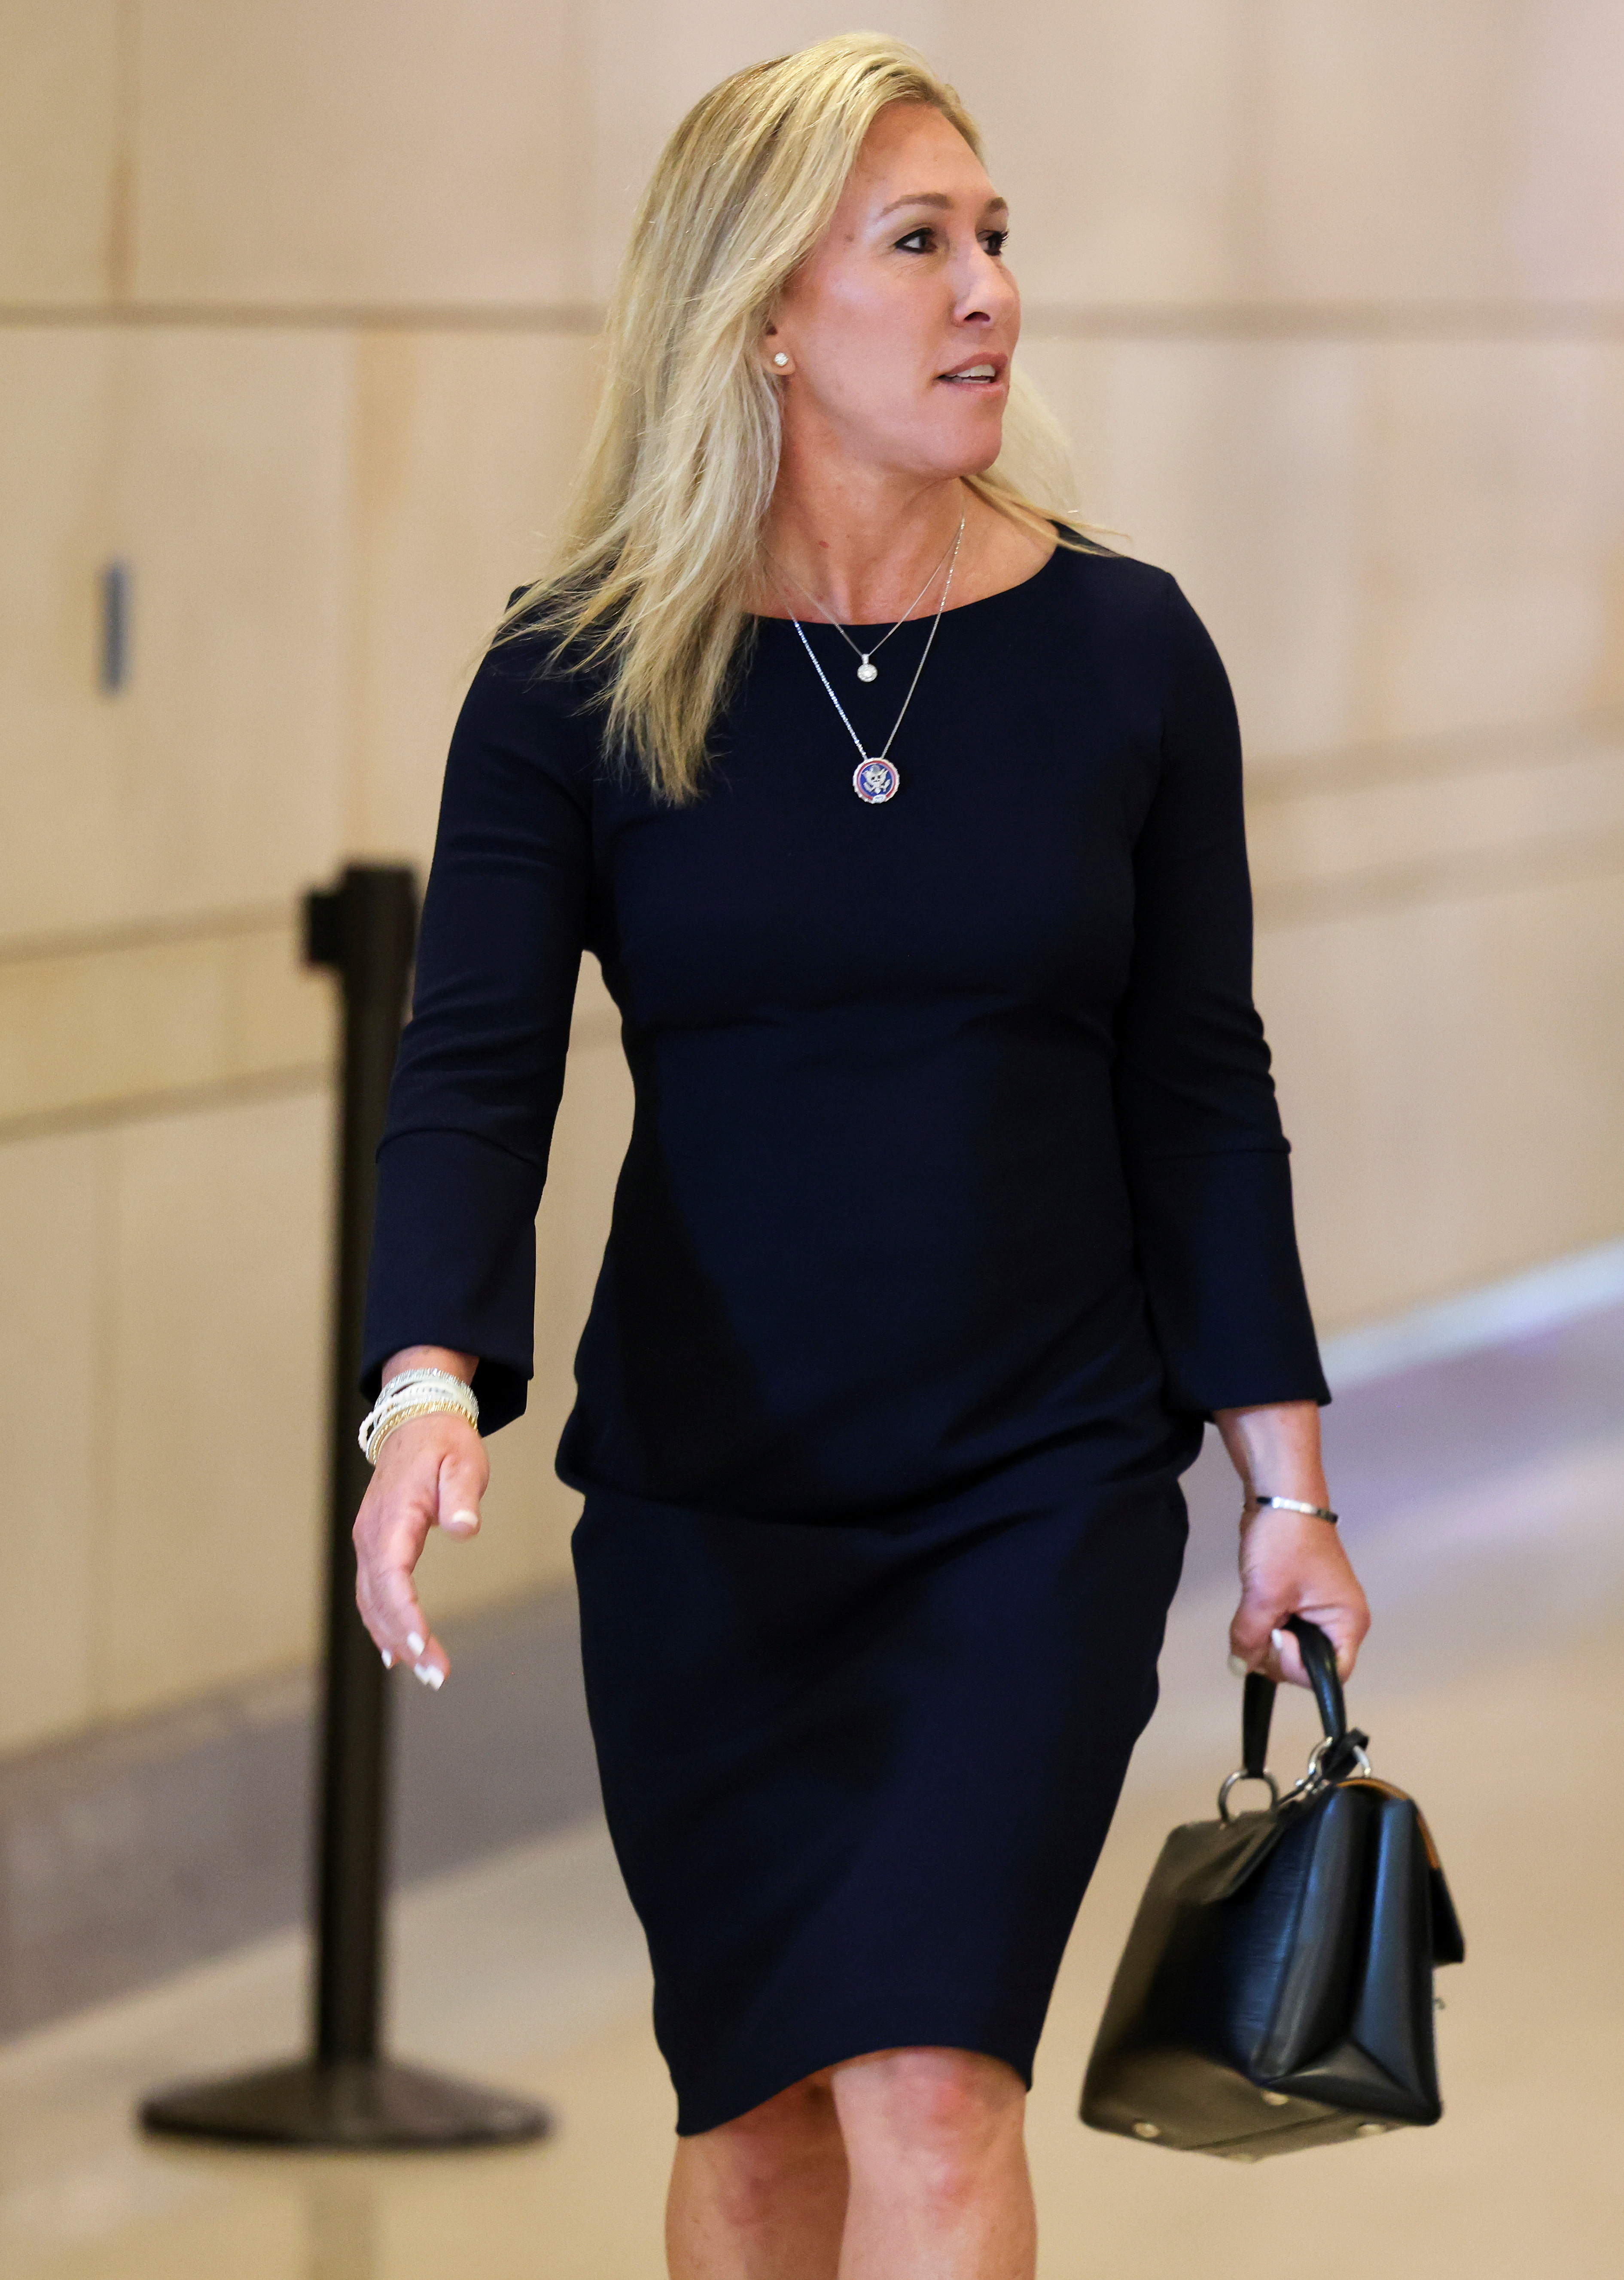 Georgia Congresswoman Marjorie Taylor Greene arrives on Capitol Hill in Washington, U.S., May 12, 2021. REUTERS/Evelyn Hockstein